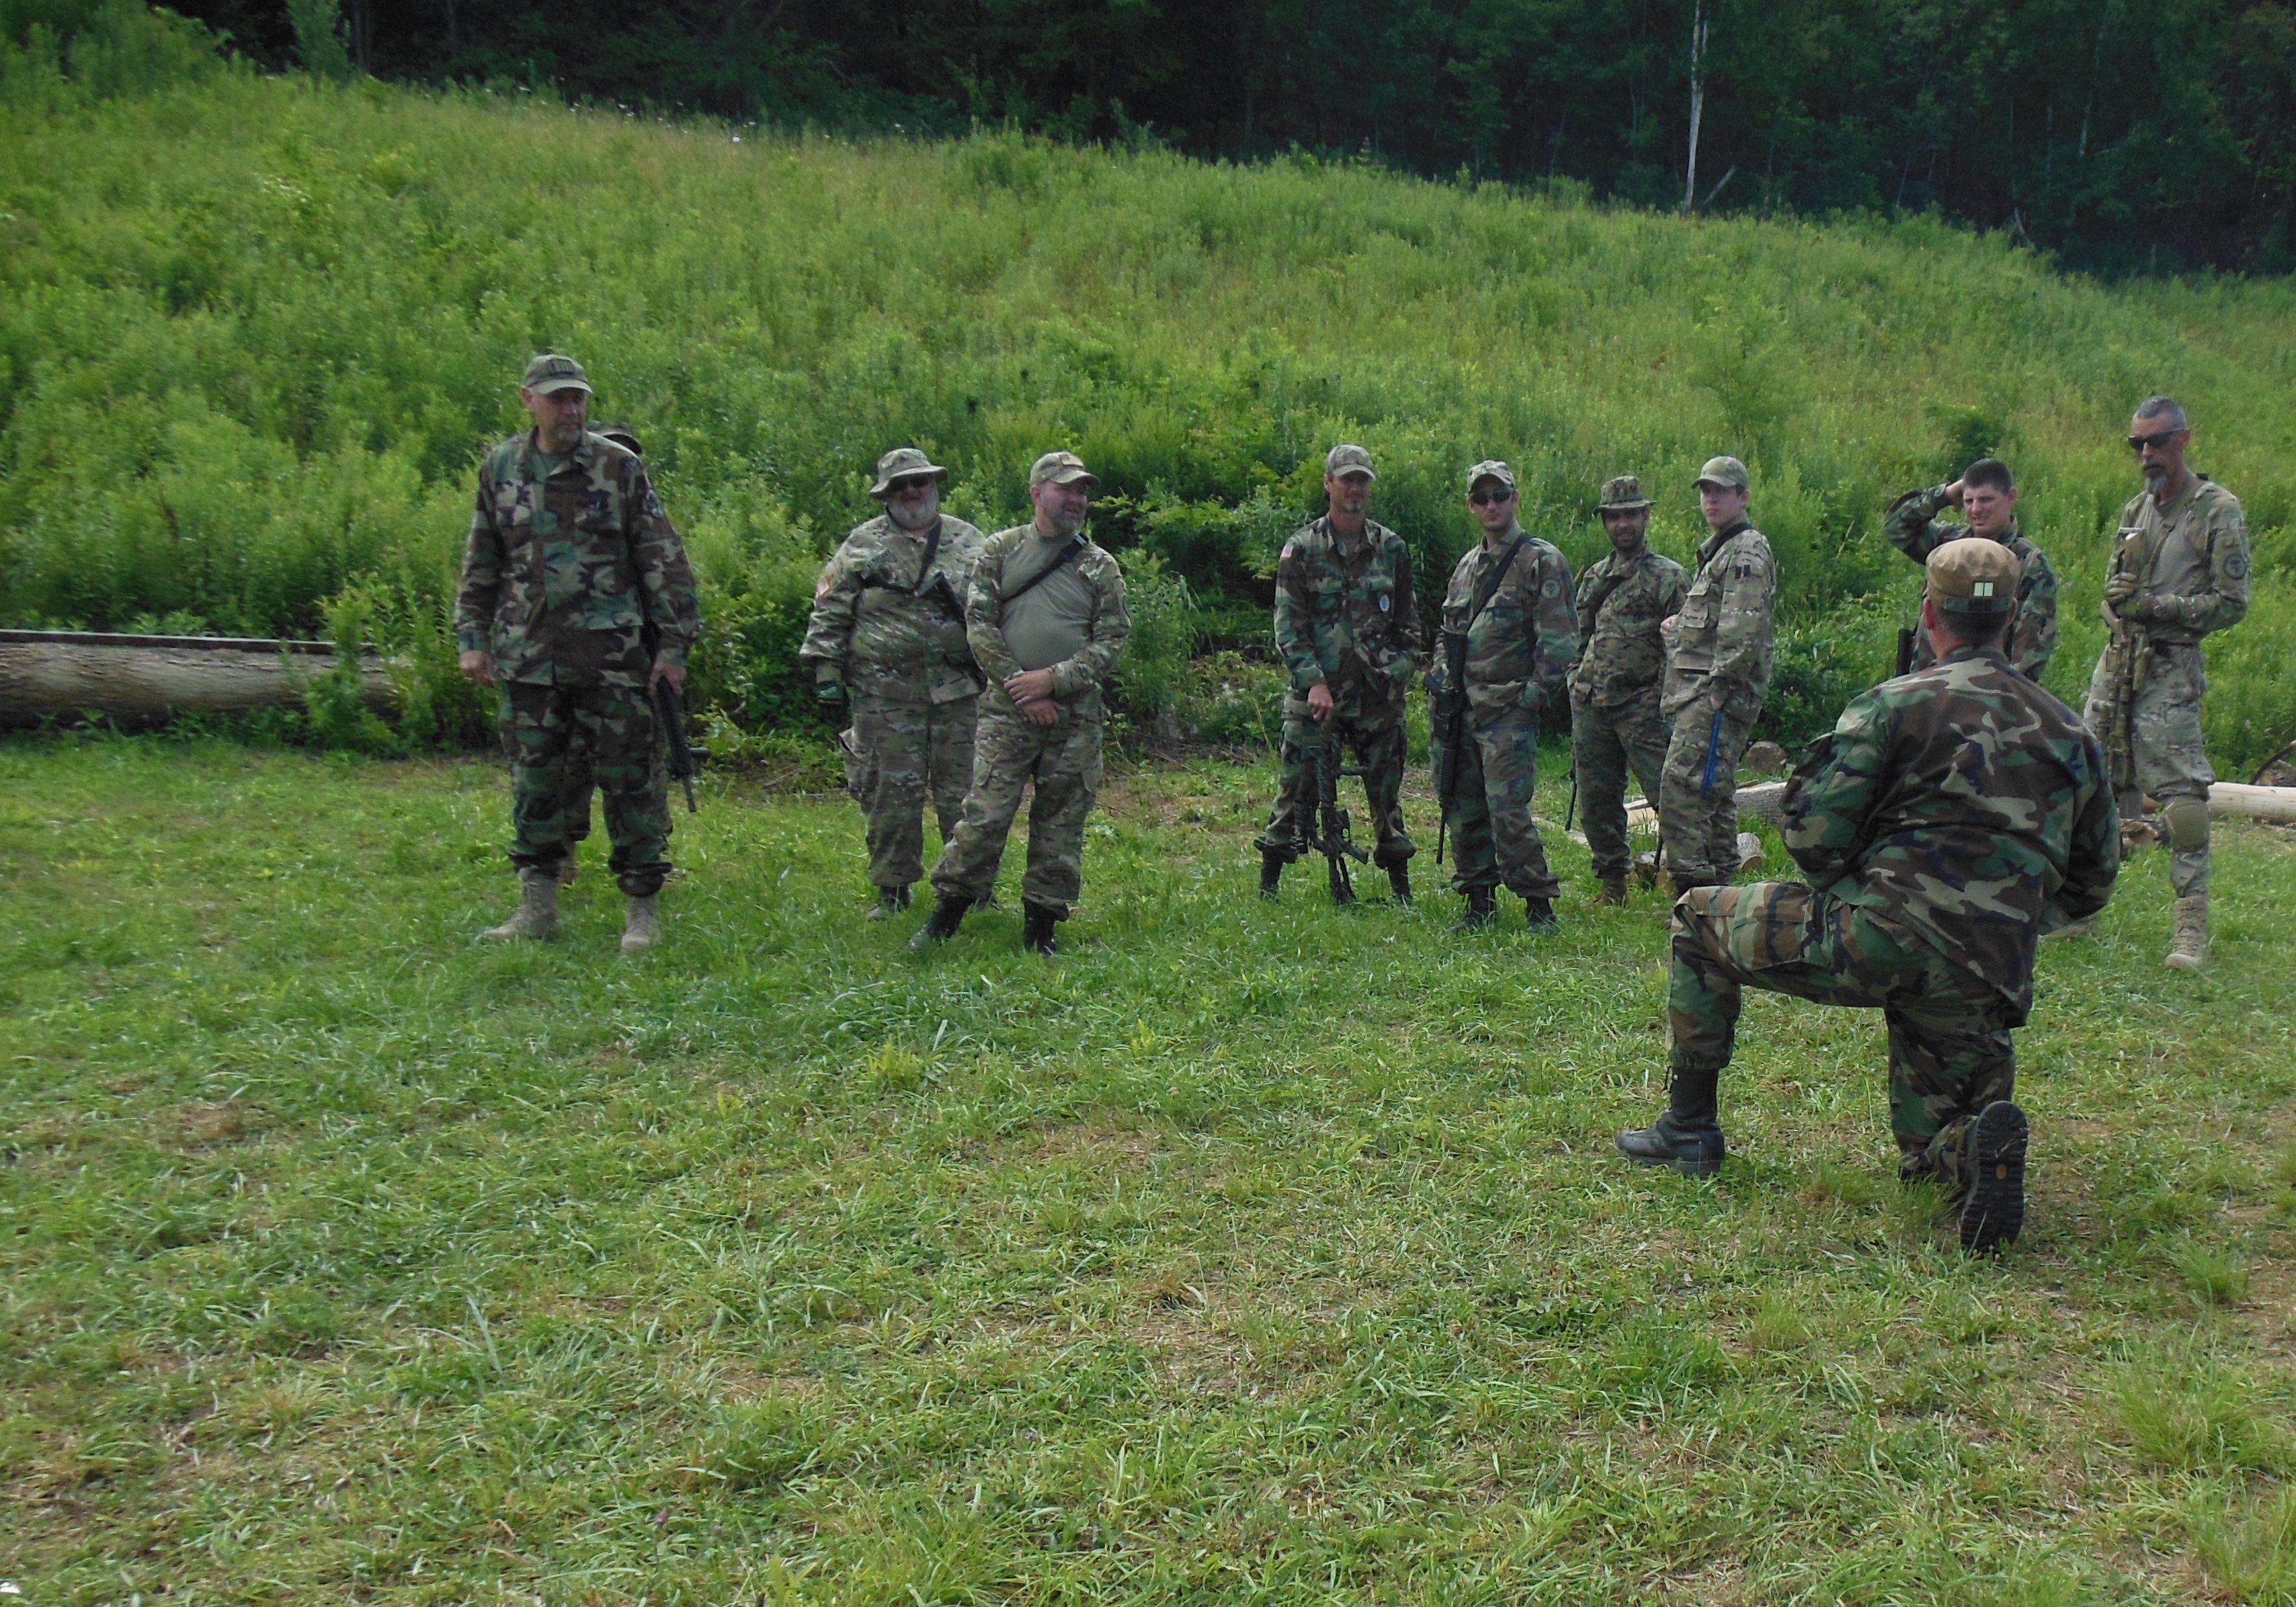 Dscn Group Survival Scenario Exercise